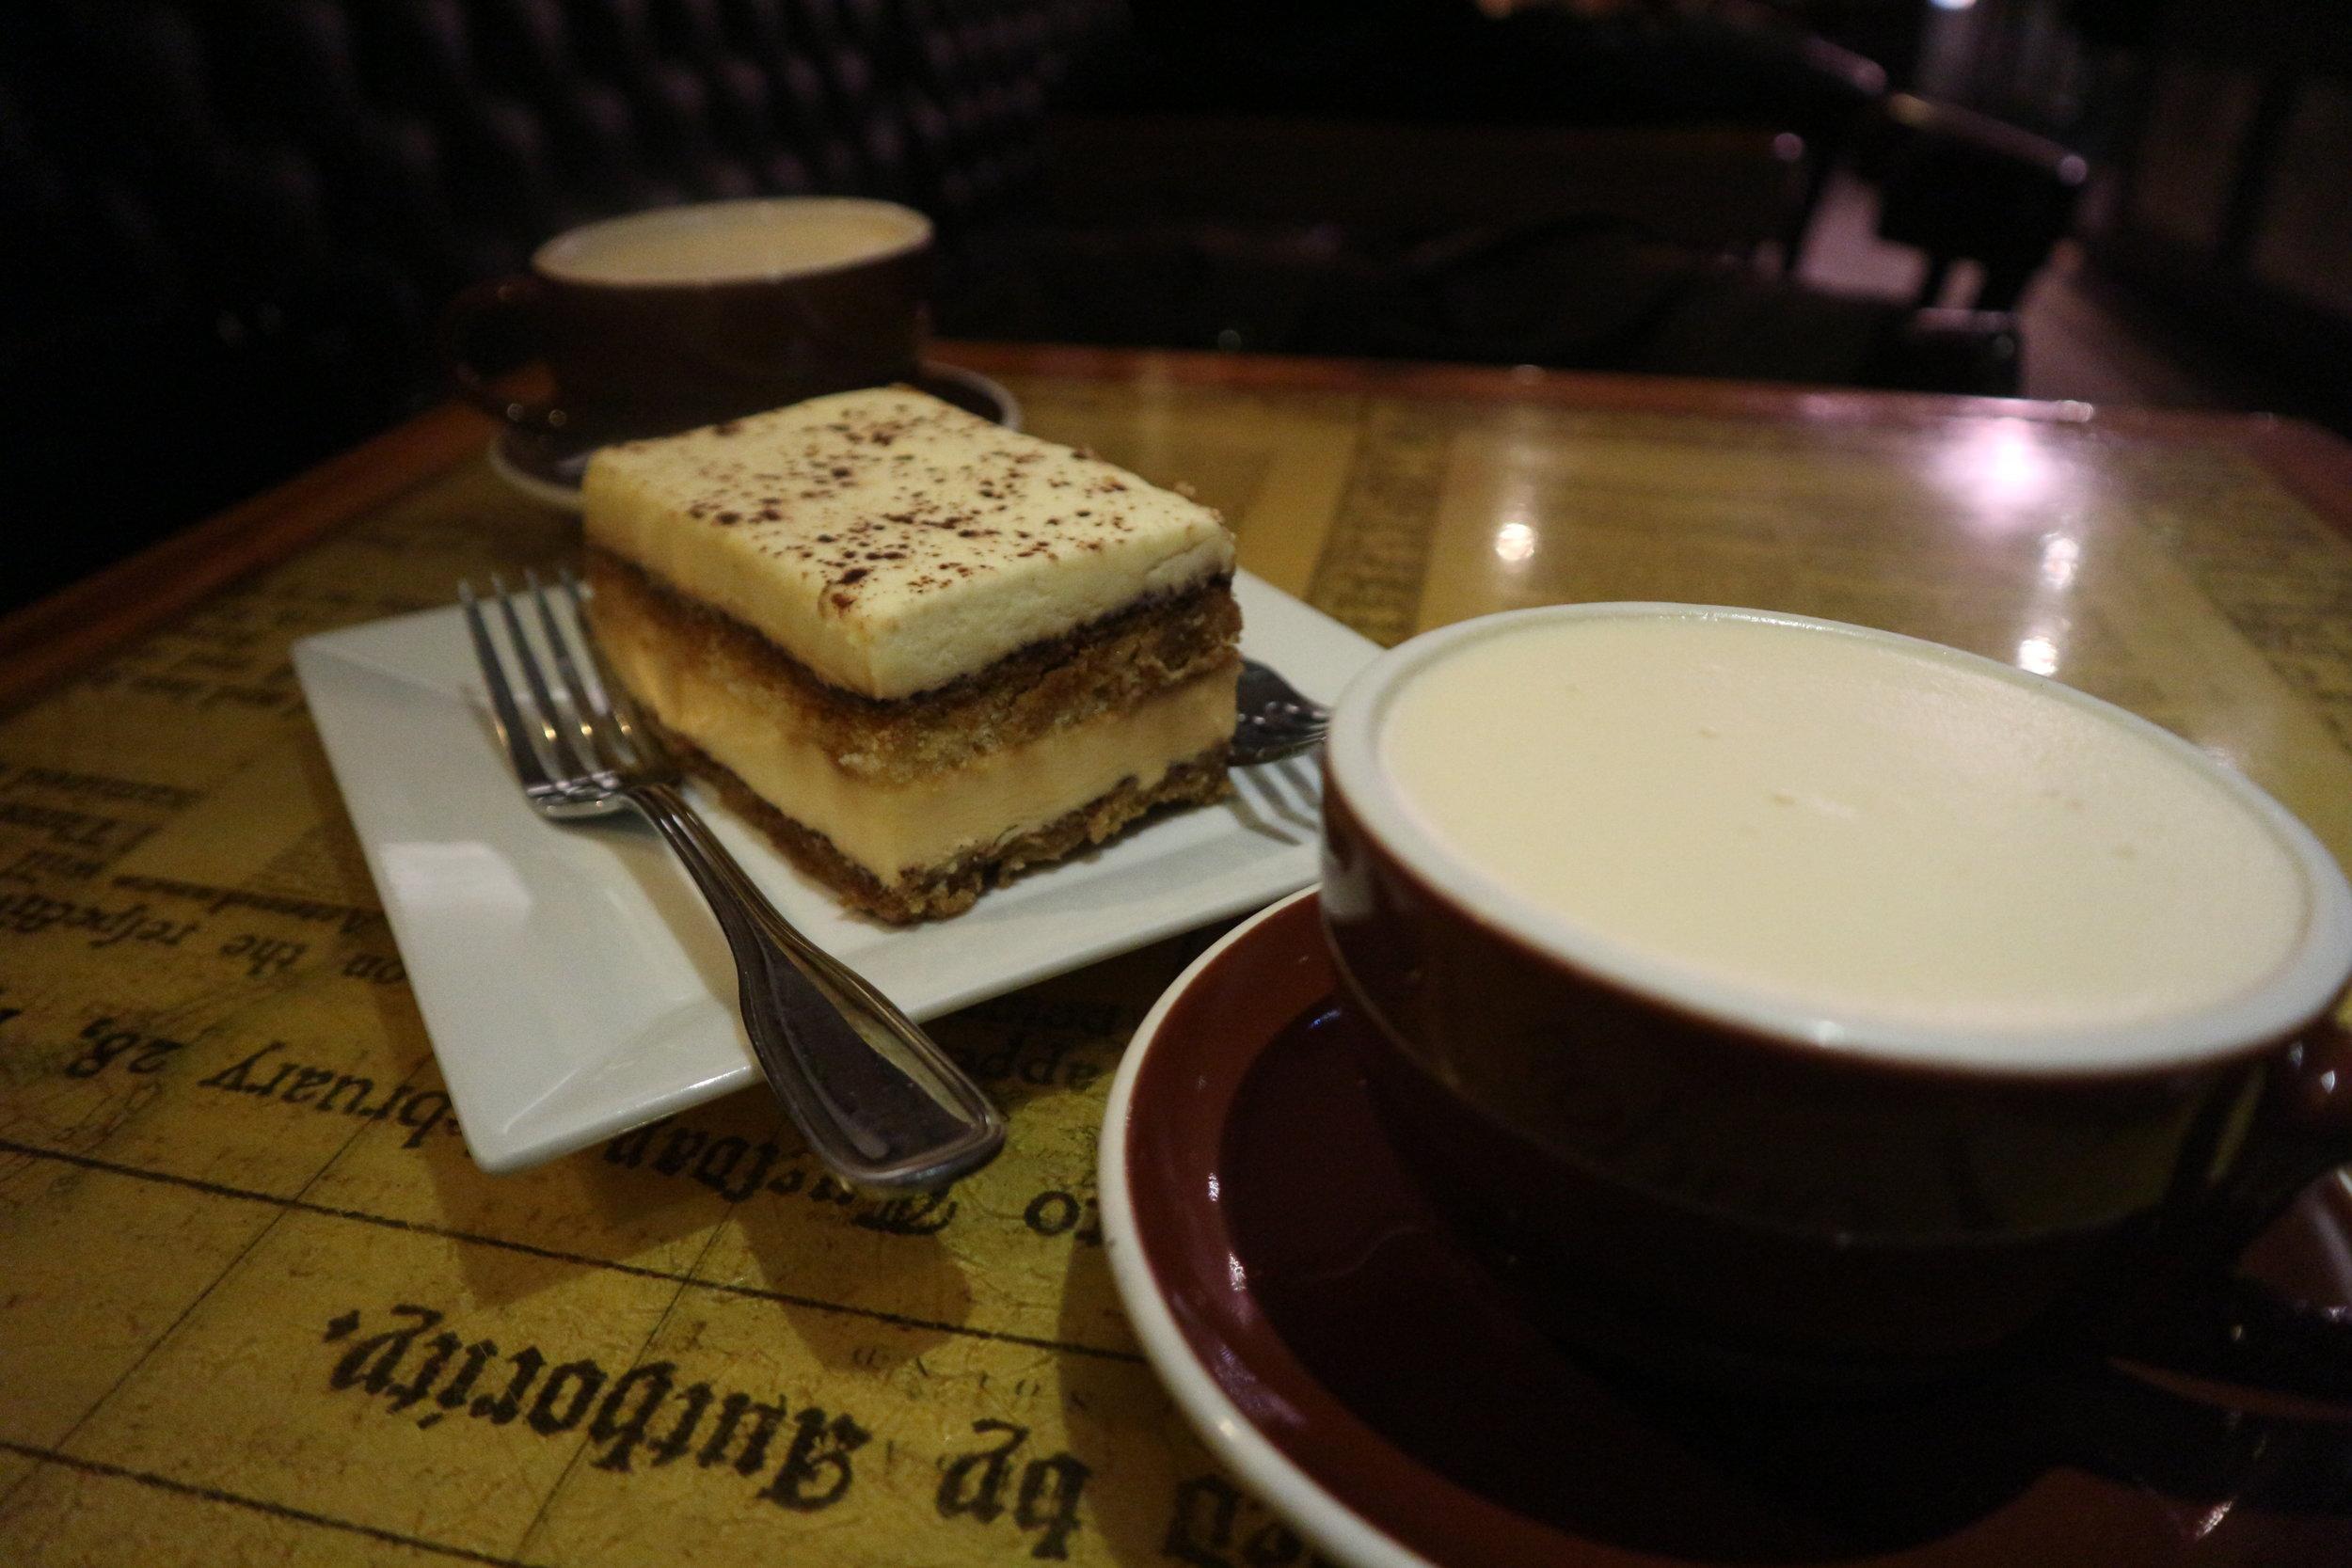 Thinking Cup: Chai Latte & Tiramisu